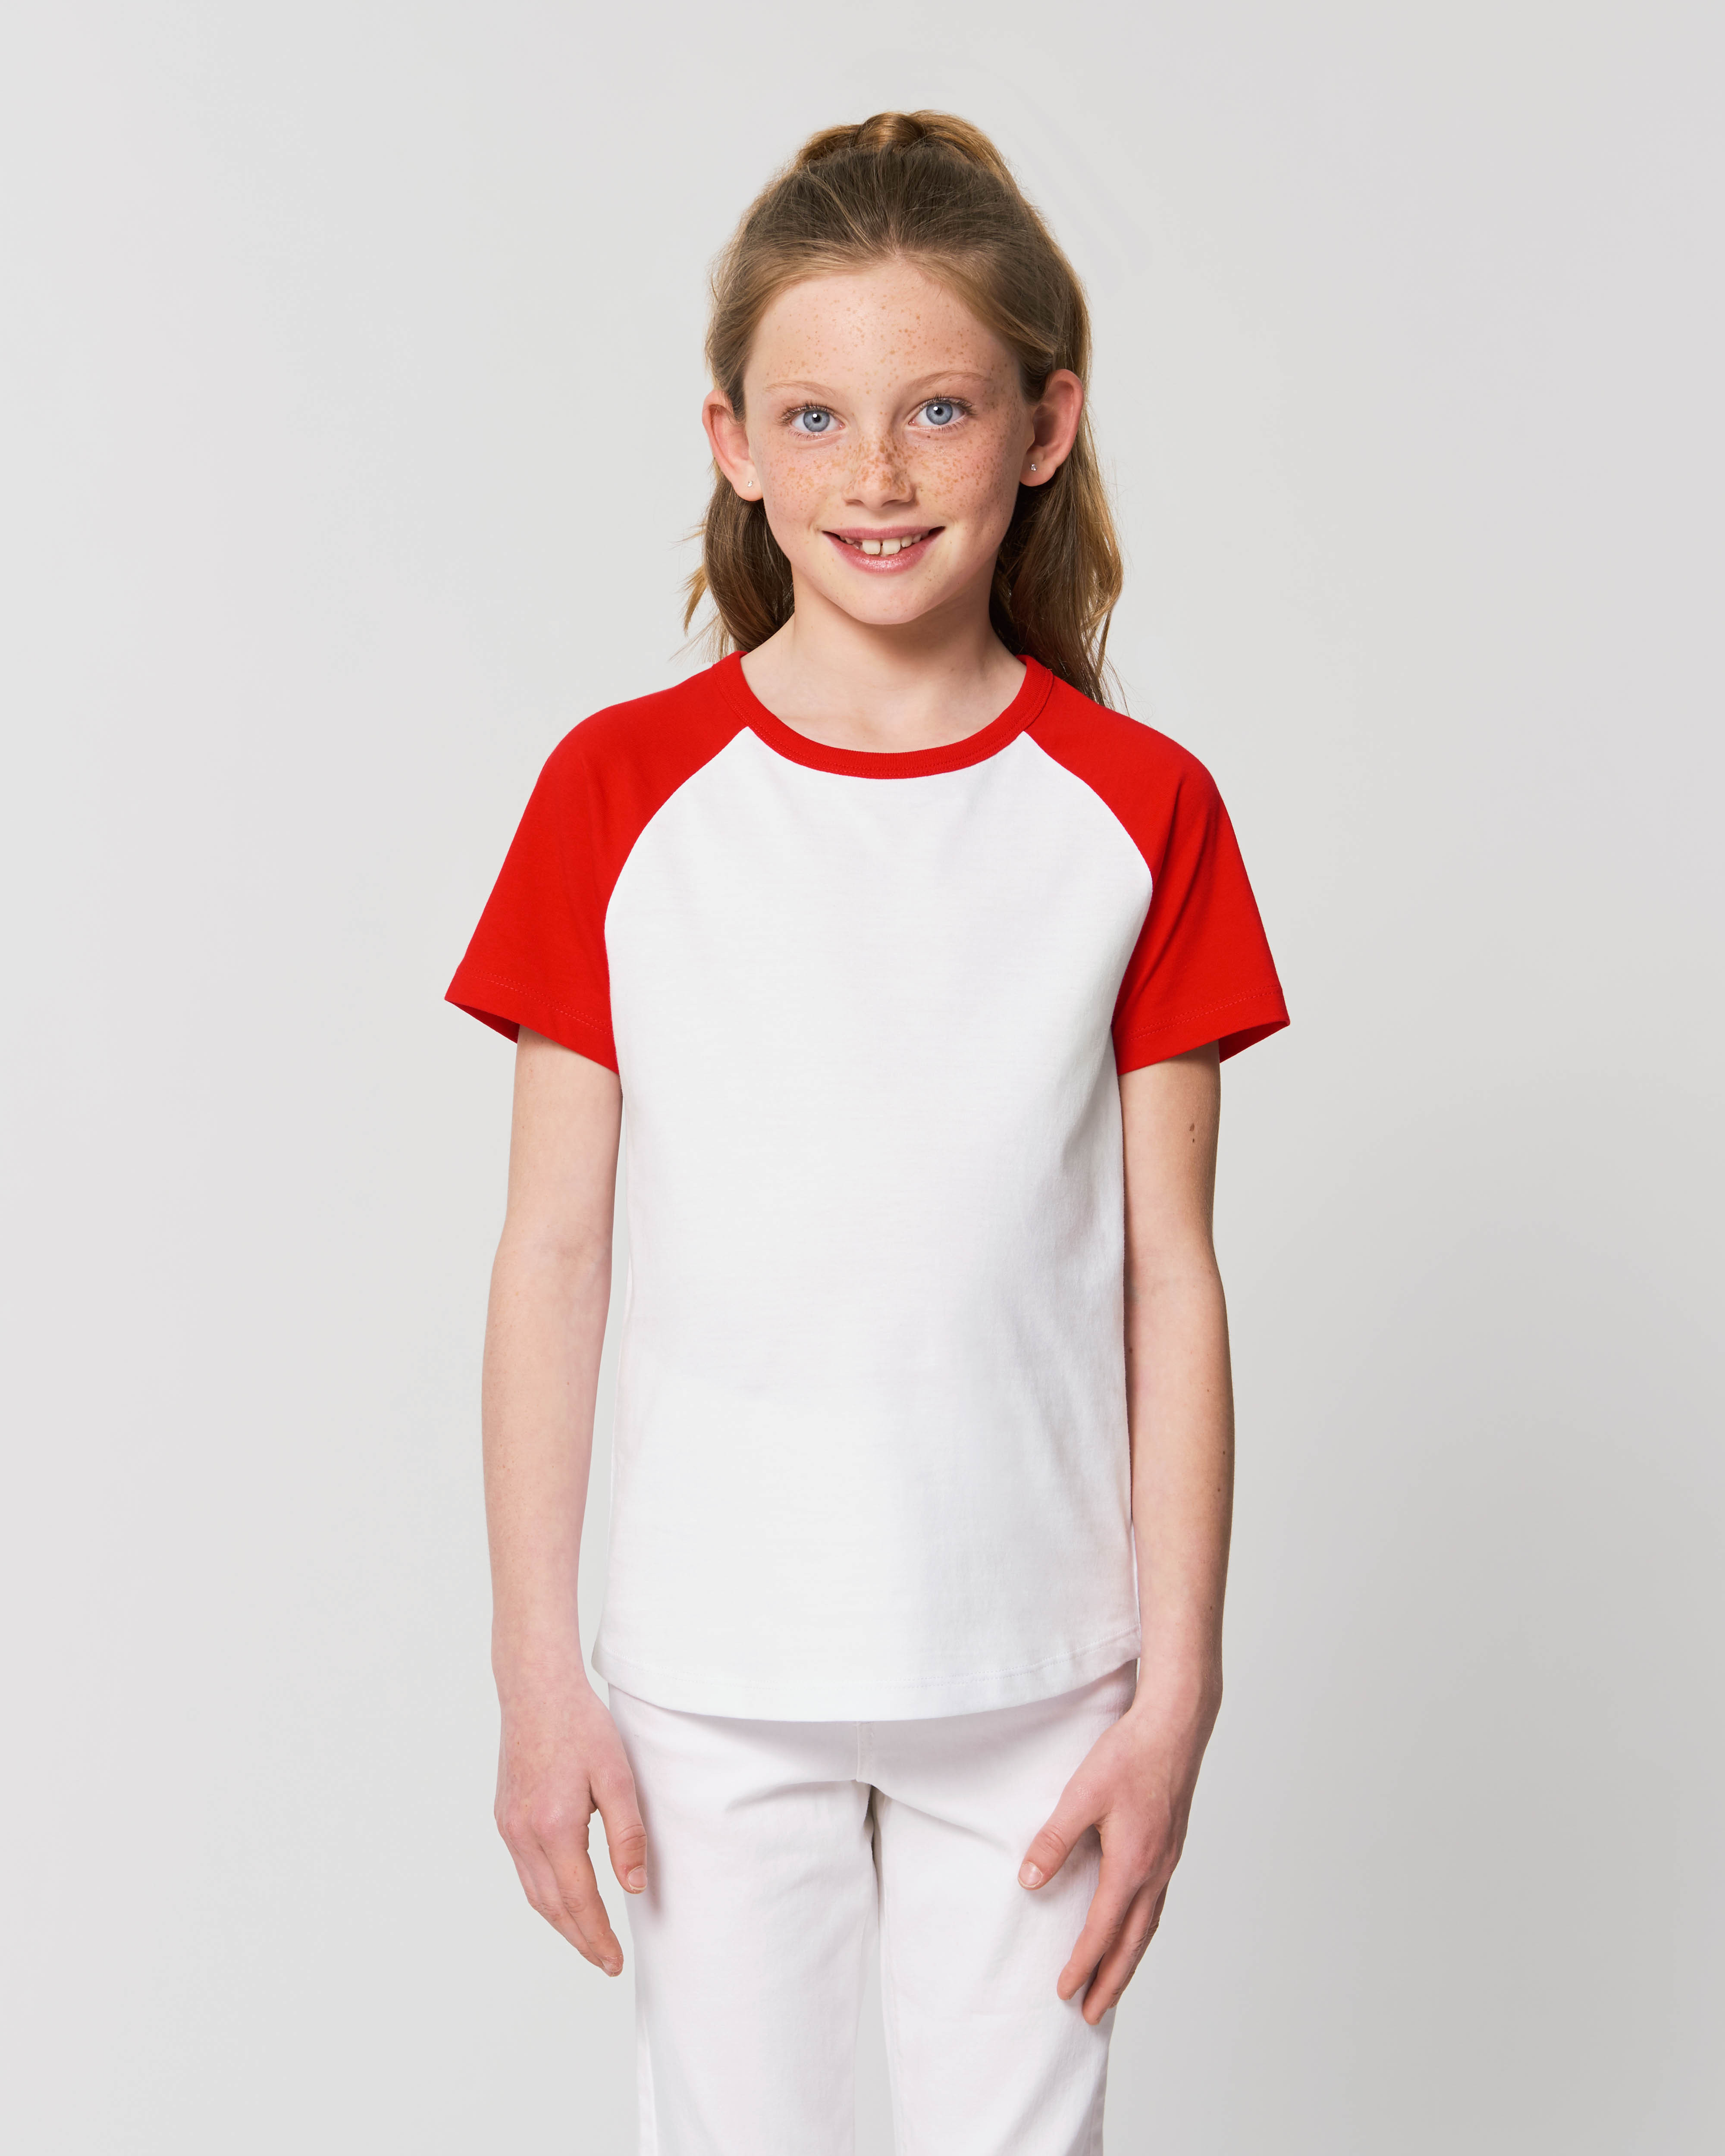 Mini Catcher Short Sleeve